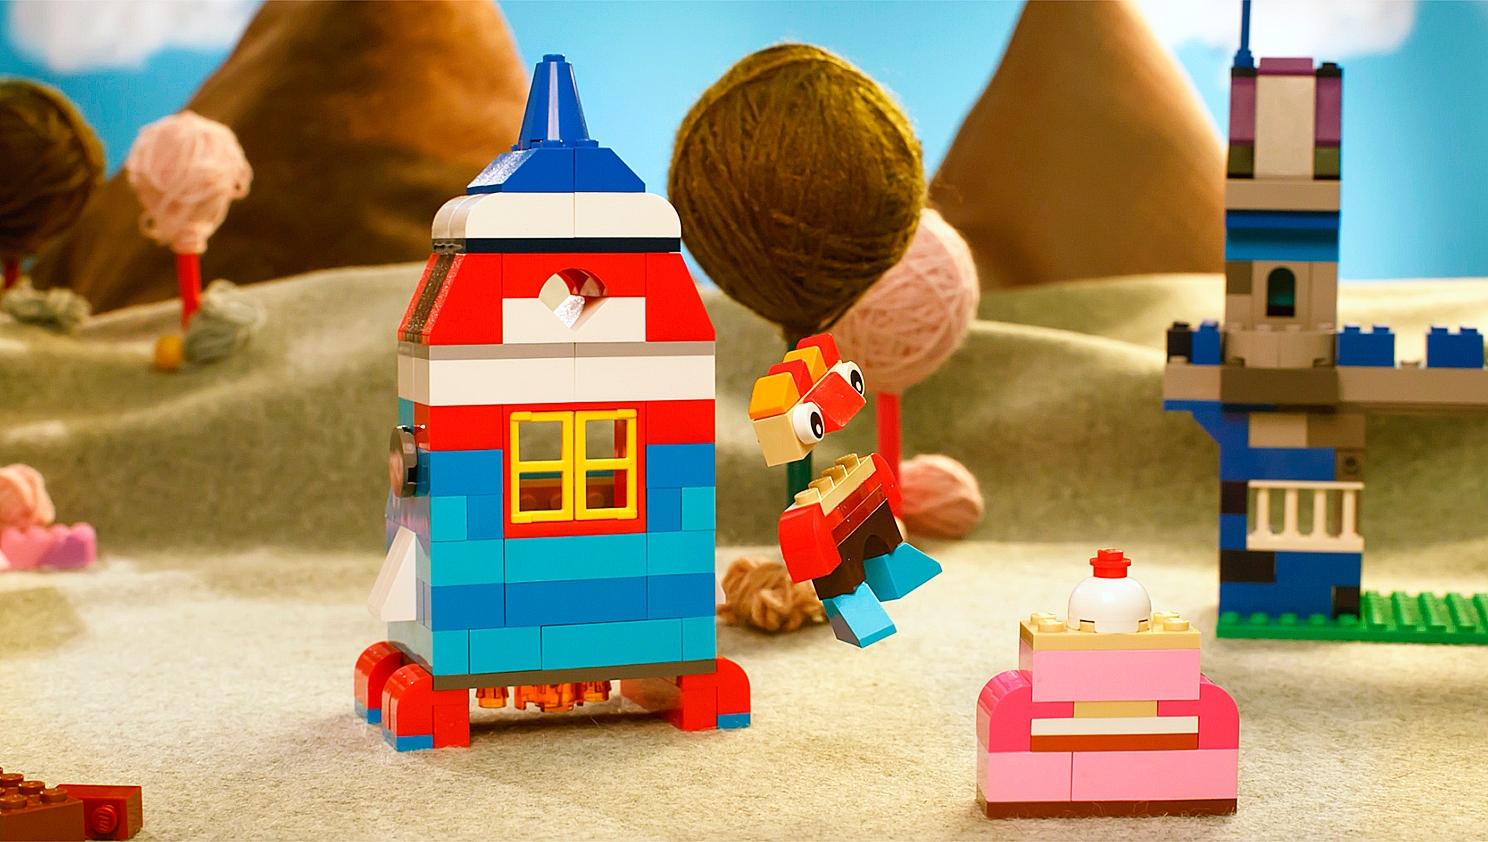 LEGO® Classic   Build fun stuff with LEGO® bricks